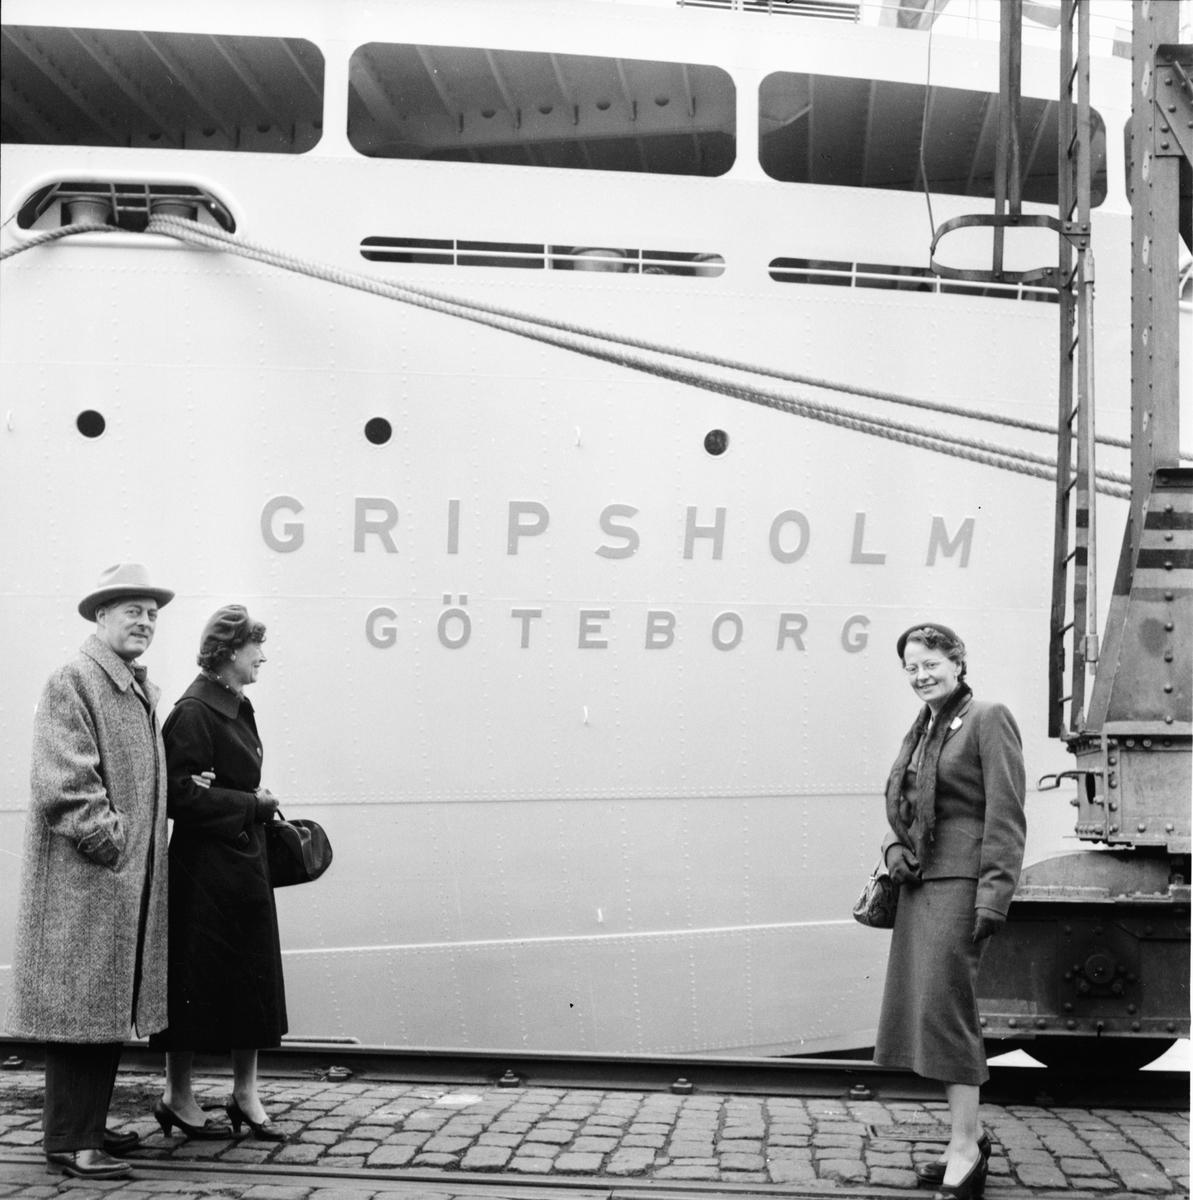 Göteborg. Lions-konferans. (Båten Gripsholm) 1957